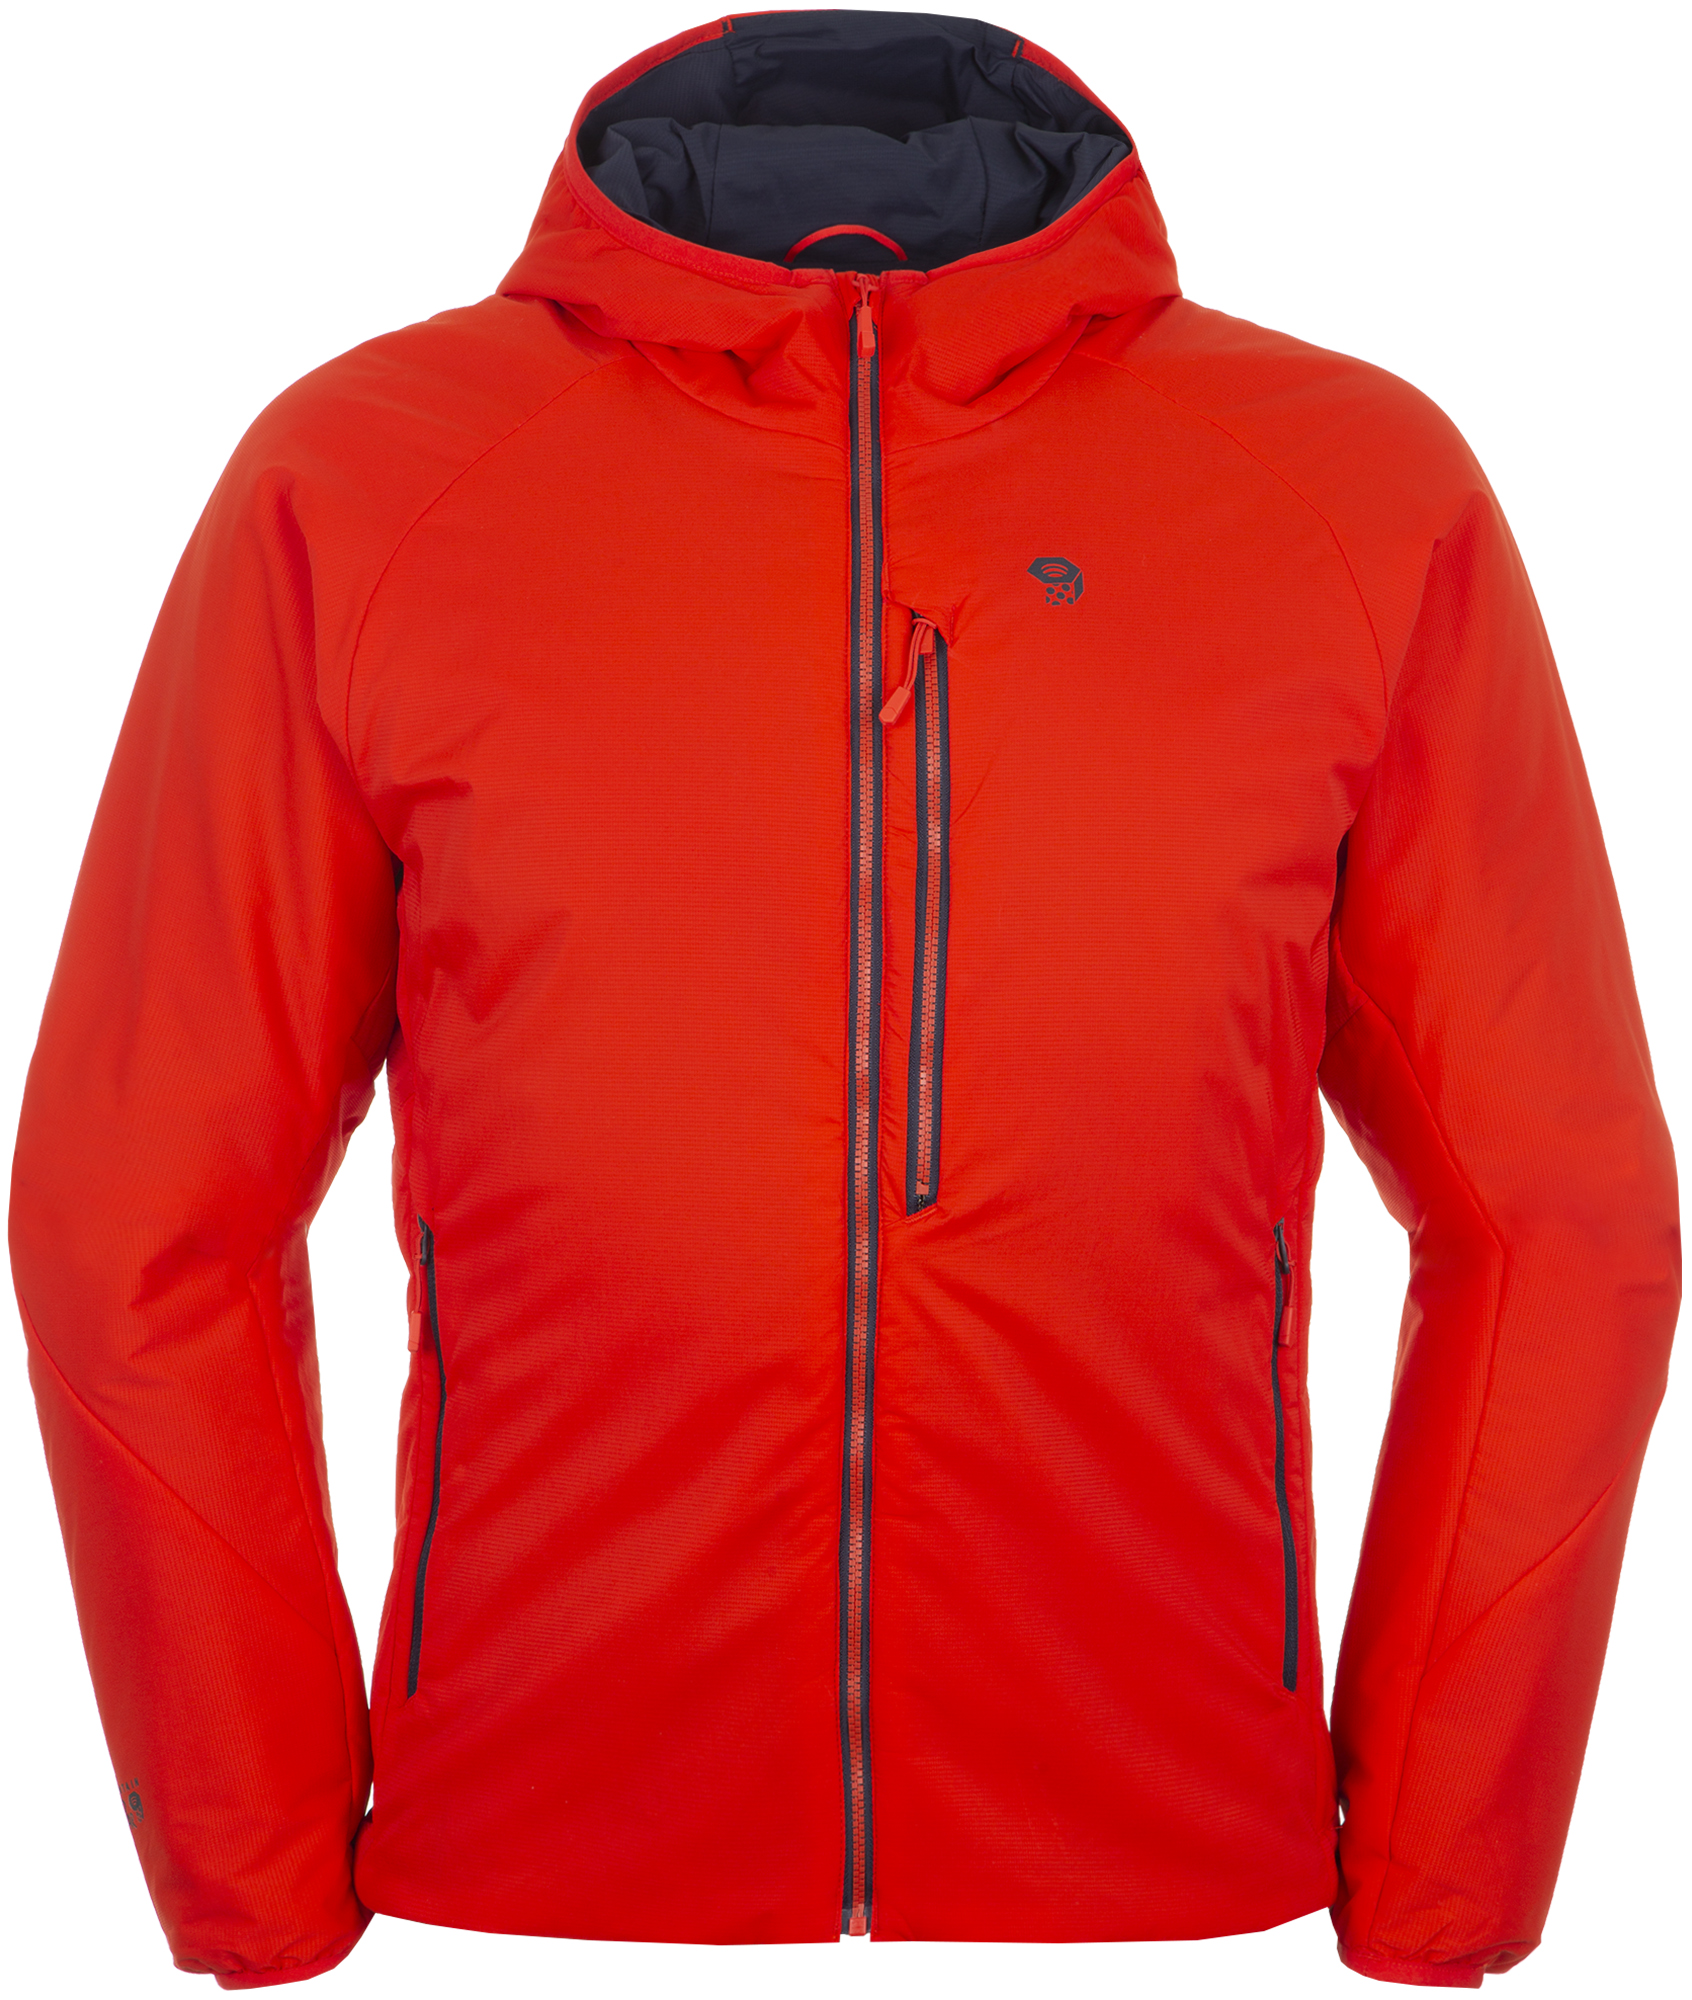 Mountain Hardwear Куртка утепленная мужская Mountain Hardwear Kor Strata, размер 56 цена